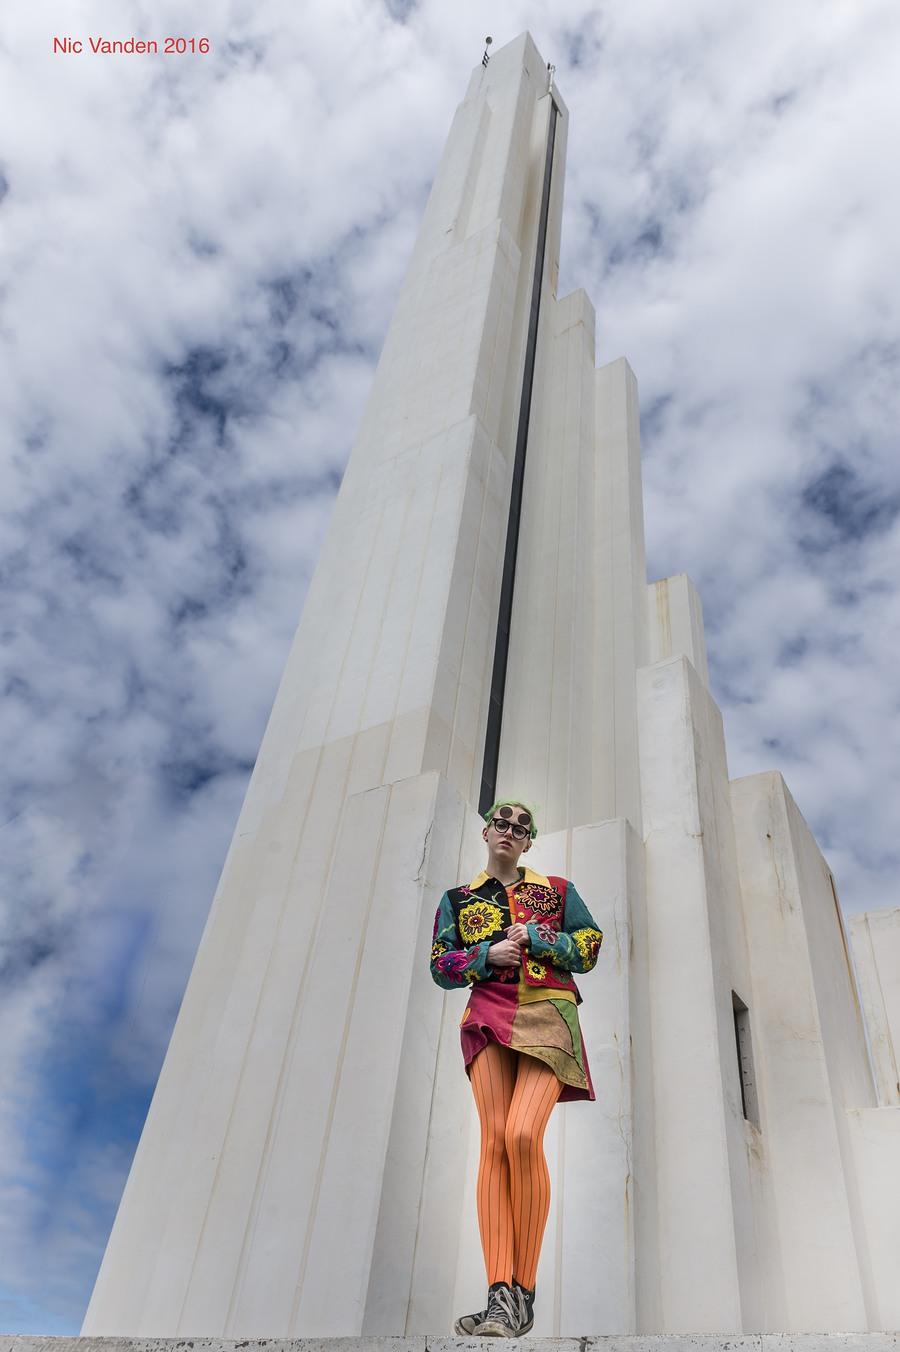 Saroumane Tower in Tenerife... / Photography by Nicolas Vanden, Model Wonderdust Supertramp, Post processing by Nicolas Vanden / Uploaded 5th April 2016 @ 12:36 AM